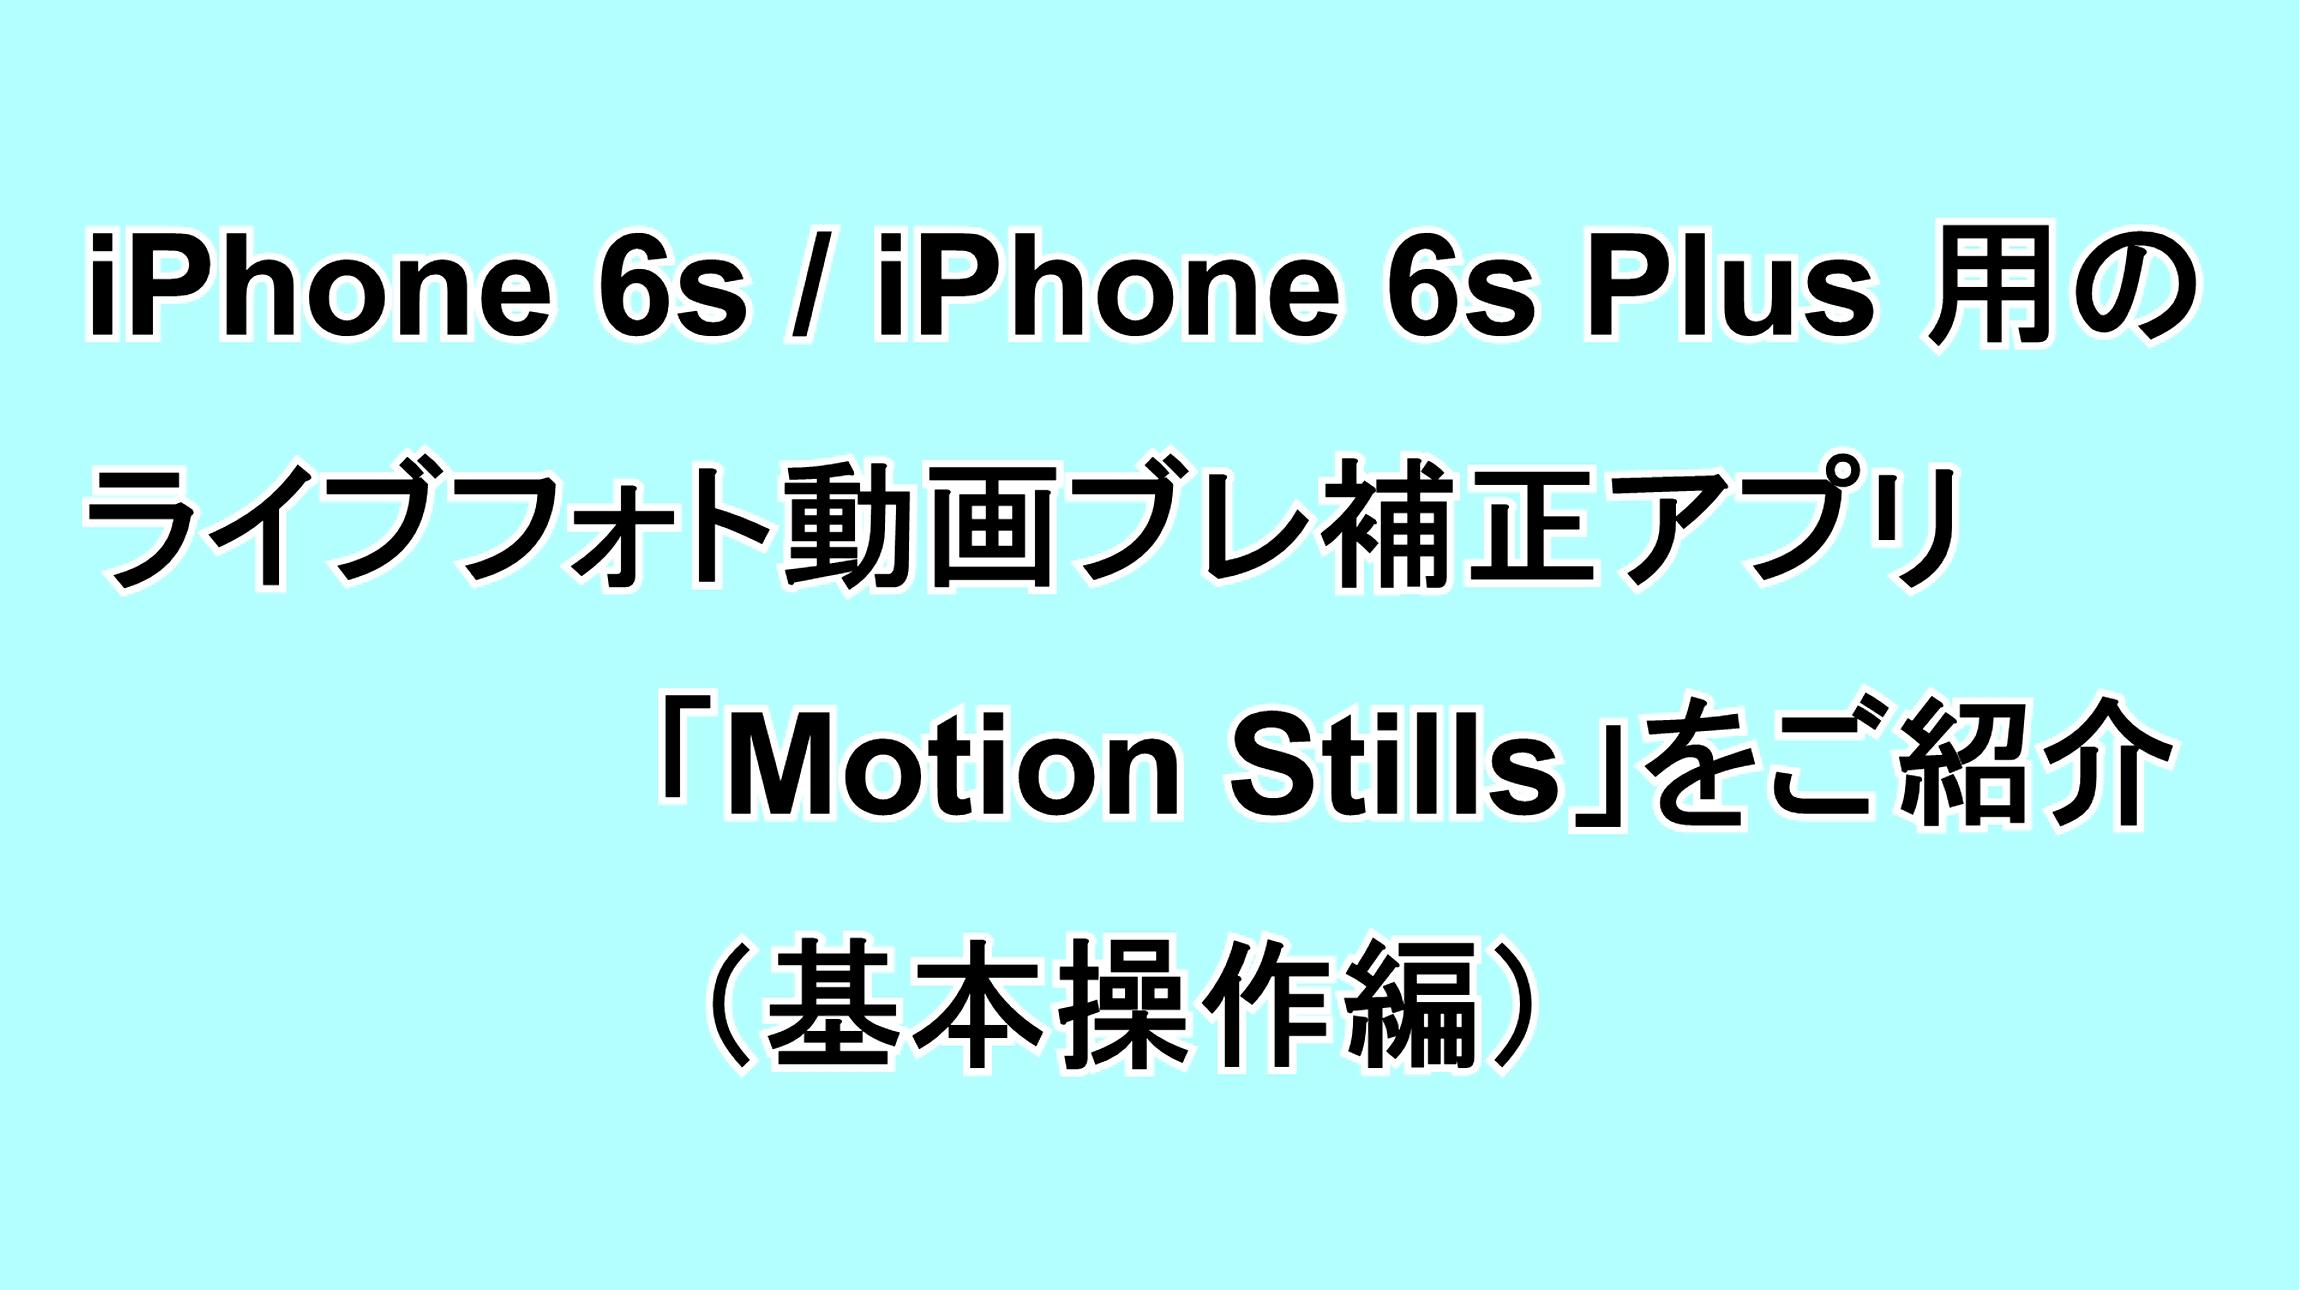 iPhone 6s/6s Plus用のライブフォト動画ブレ補正アプリ「Motion Stills」をご紹介(基本操作編)